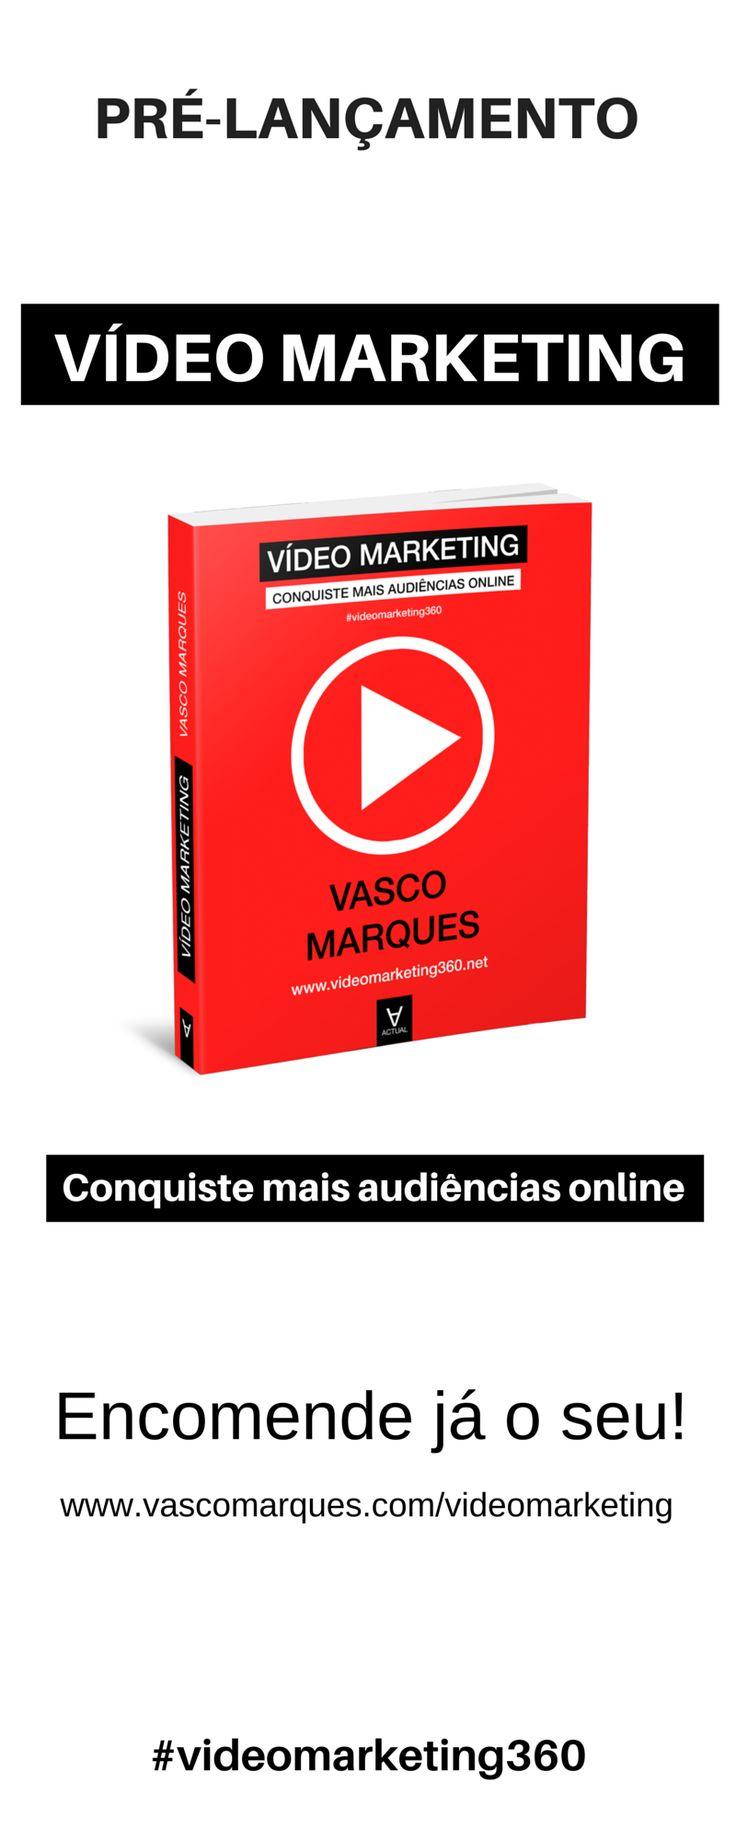 http://vascomarques.com/videomarketing